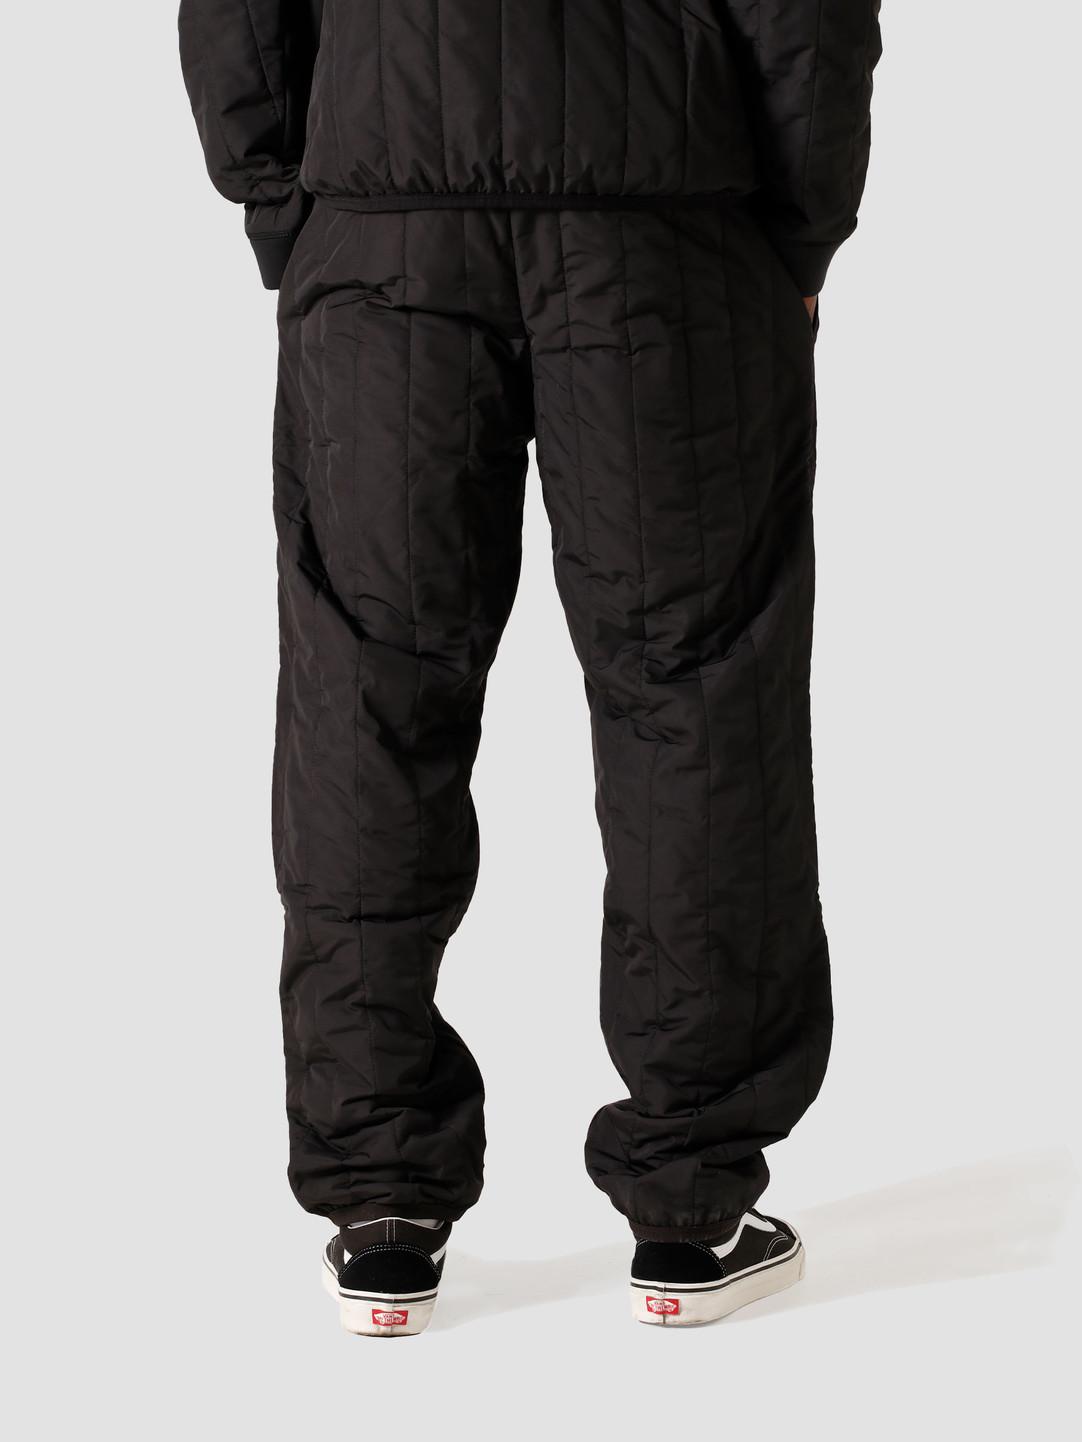 Helly Hansen Helly Hansen HH Arc Padded Pants Black 53565-990